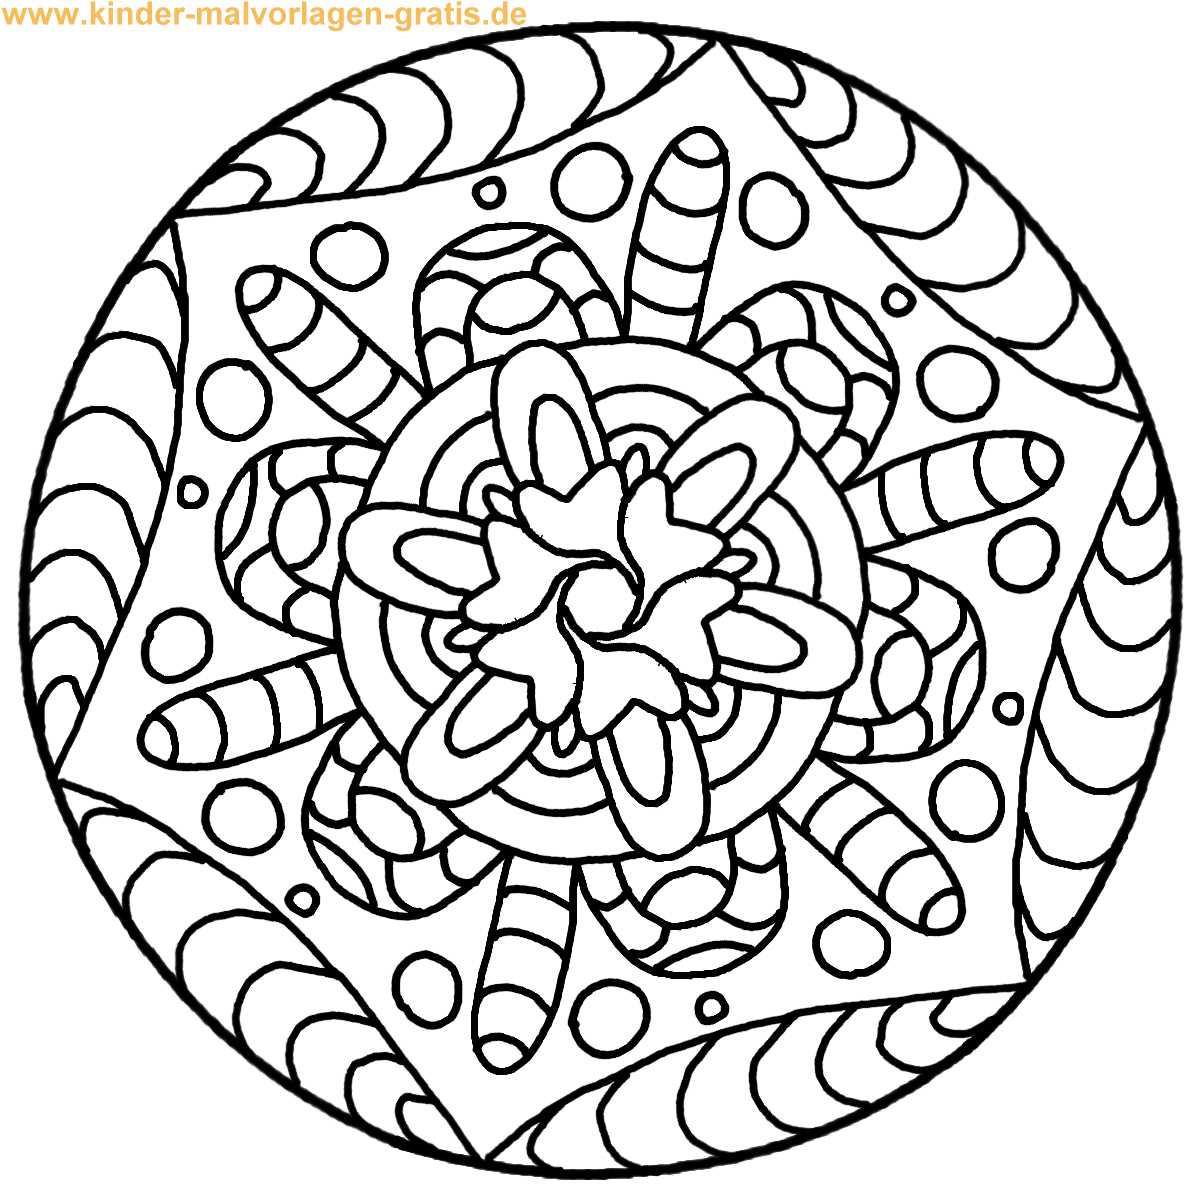 Malvorlagen Mandala  Ausmalbilder mandala kostenlos Malvorlagen zum